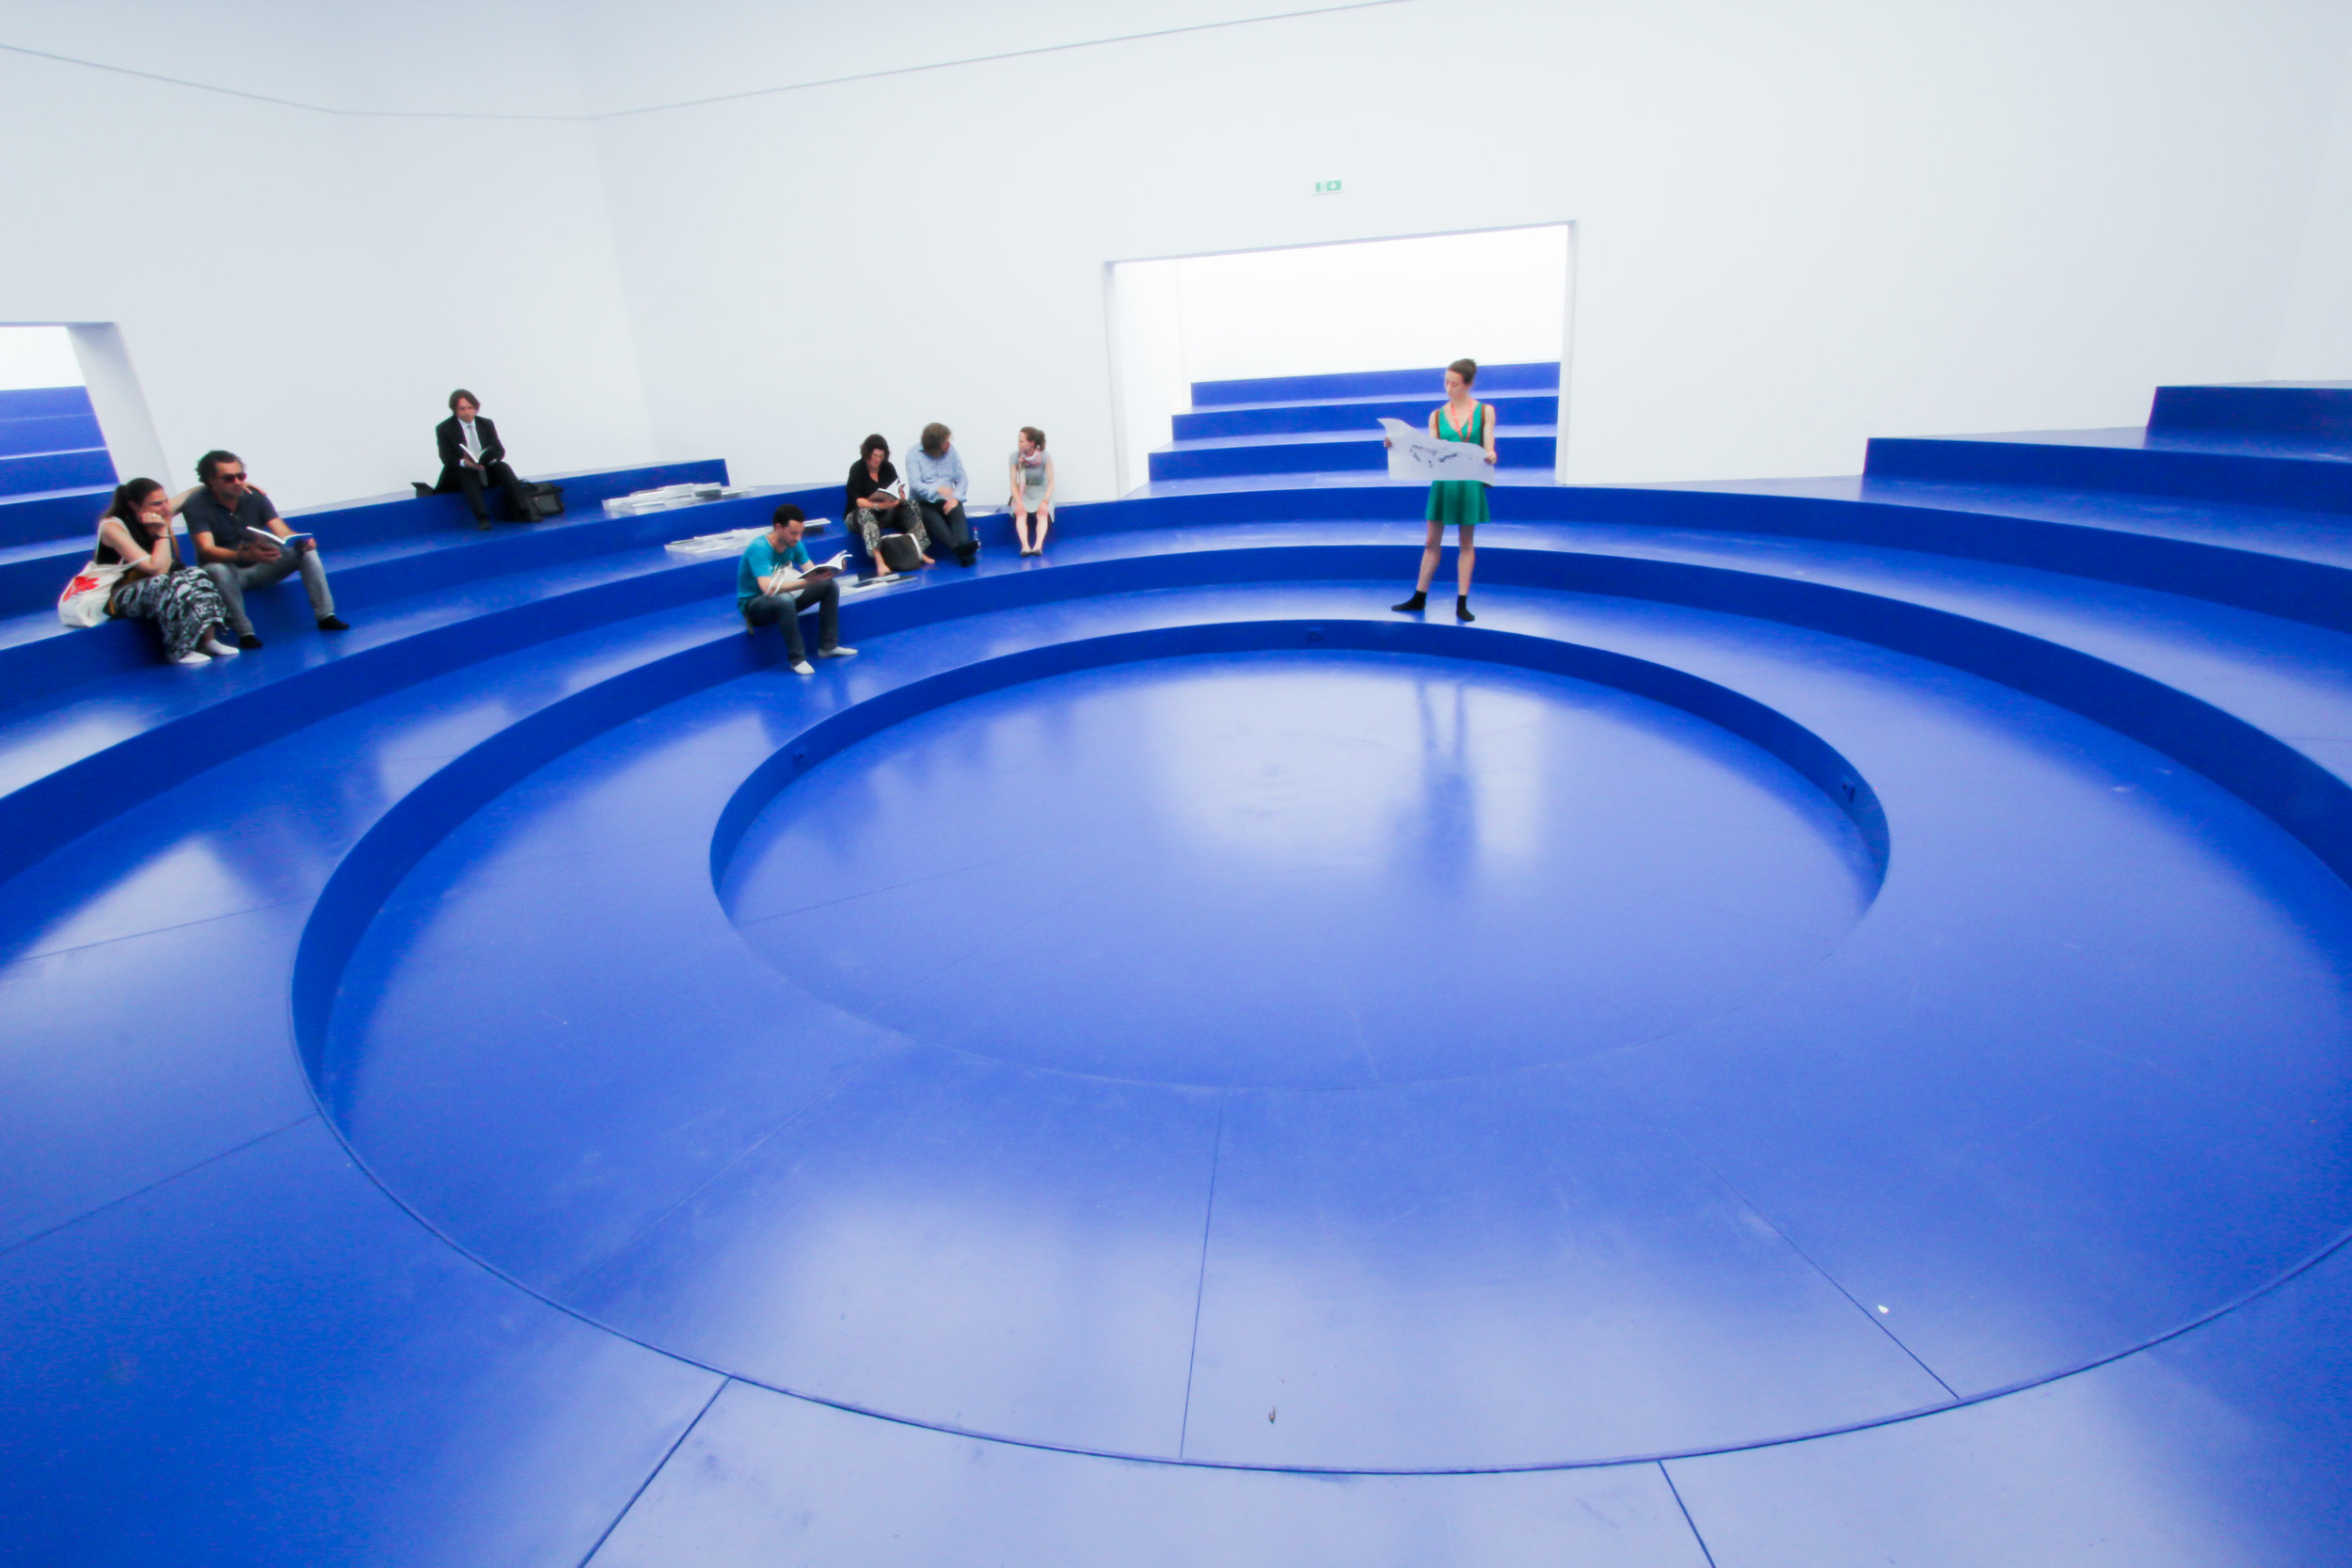 Eurotopie. Belgium Pavilion. Biennale of Architecture 2018. Image ©FUTURECRAFTER